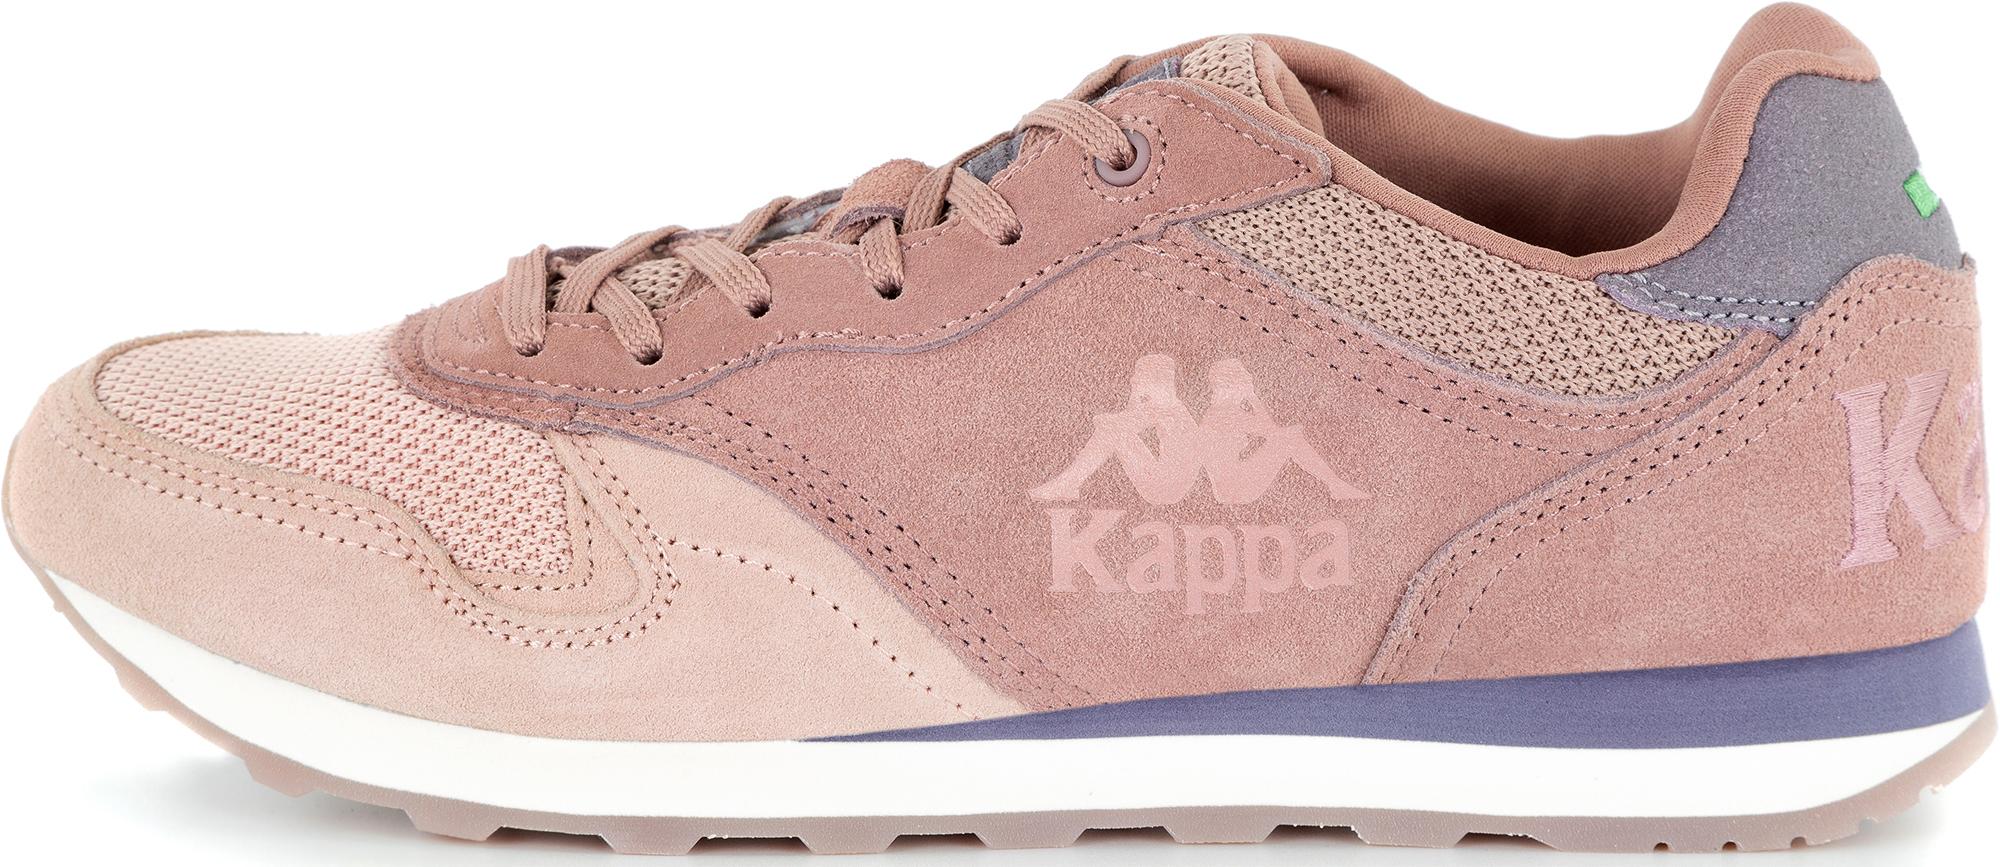 Kappa Кроссовки женские Kappa Authentic Run, размер 41